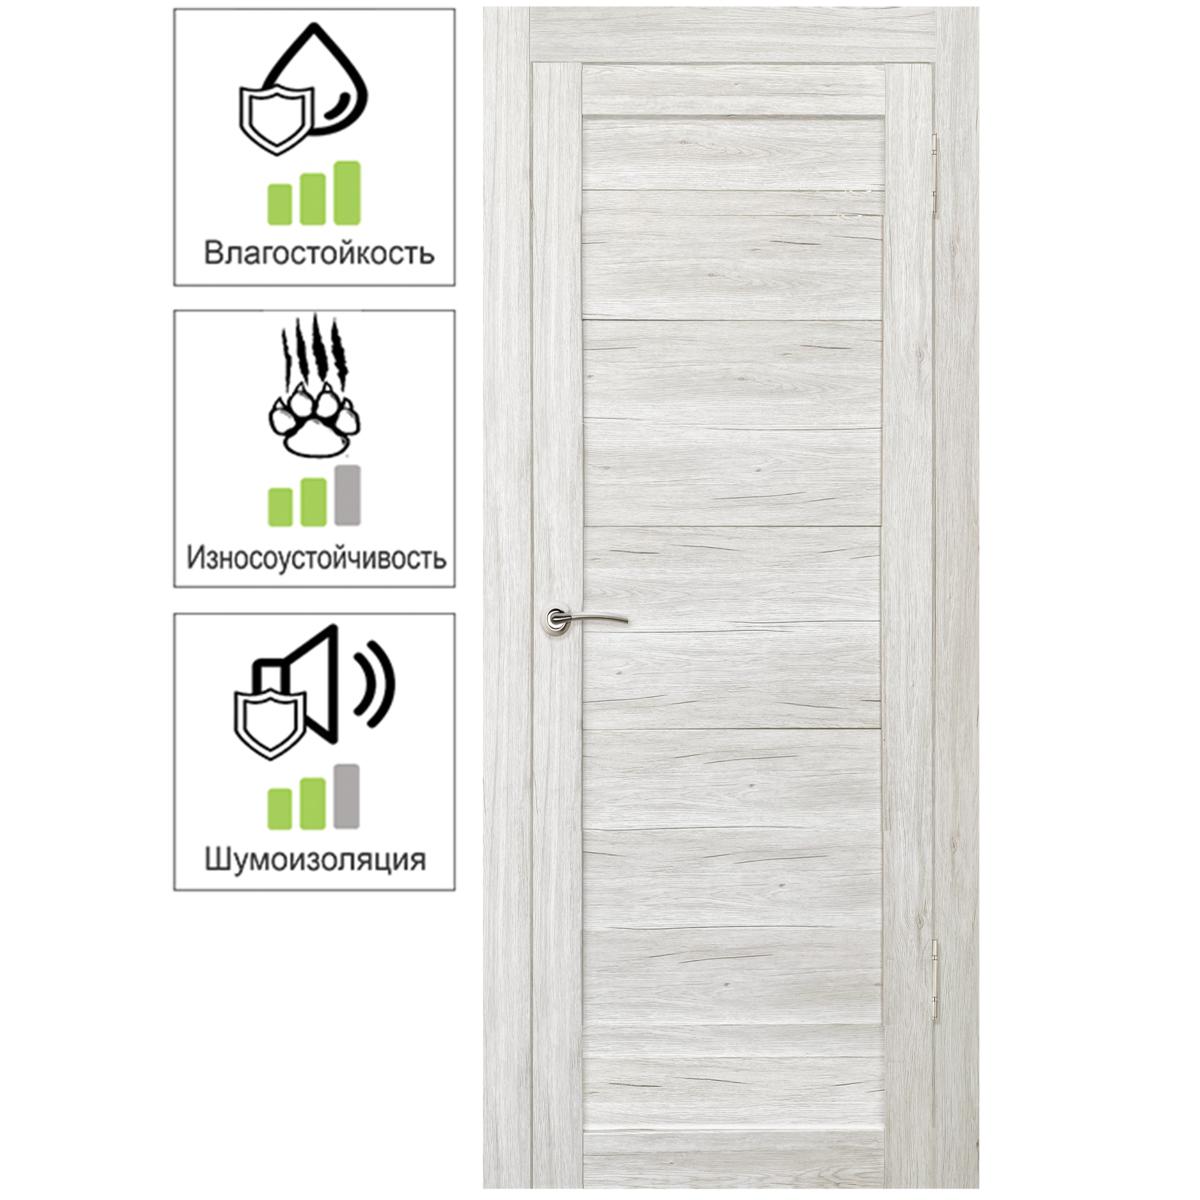 Дверь межкомнатная Тиволи 70х200 см с фурнитурой ПВХ цвет рустик серый